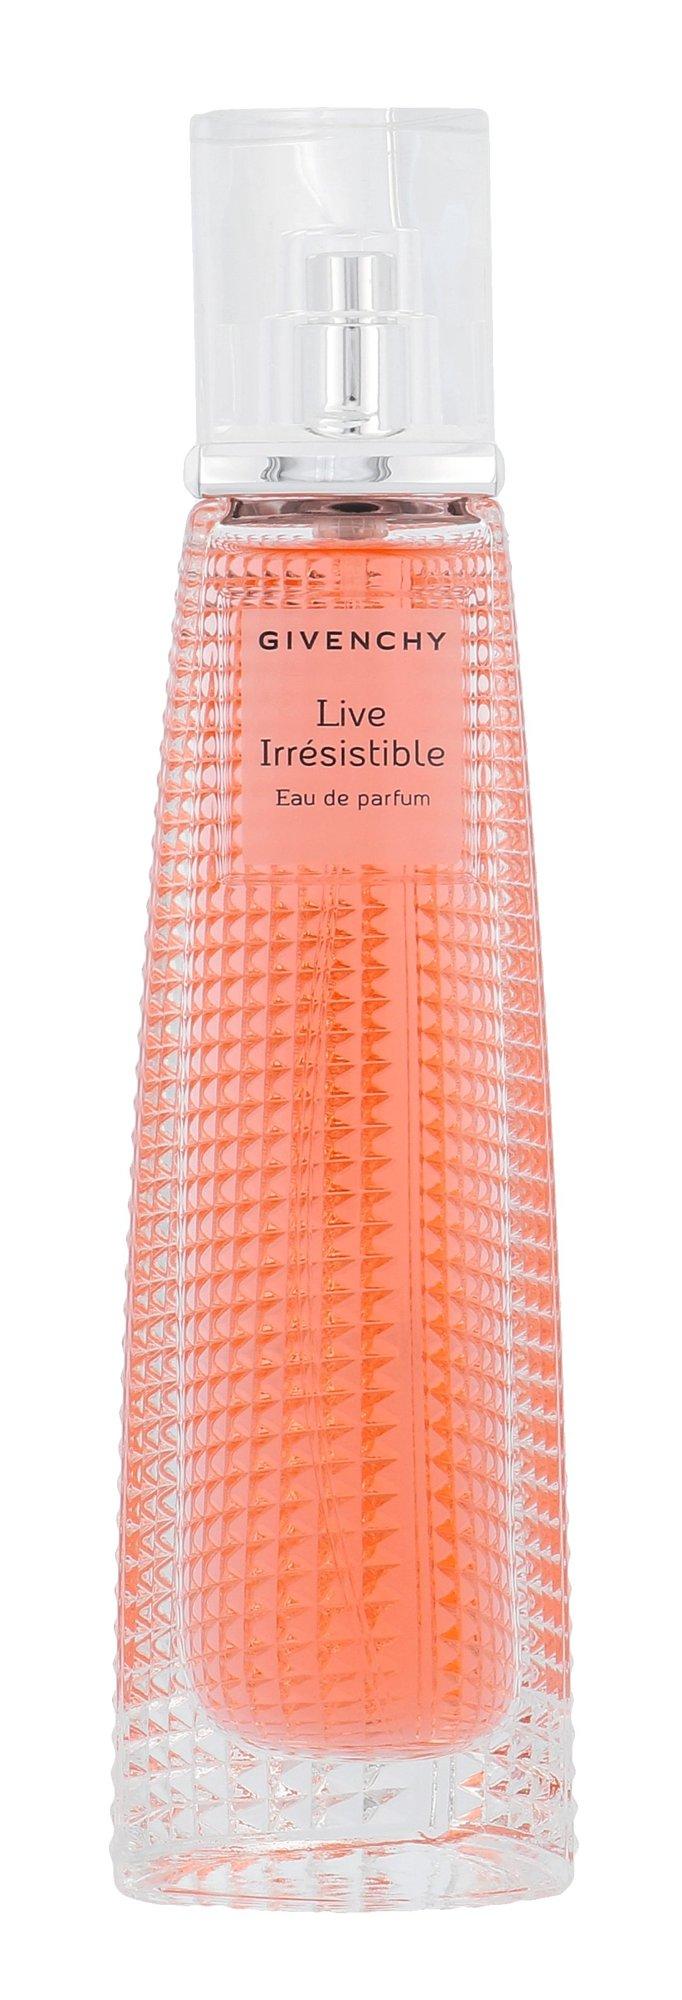 Givenchy Live Irrésistible EDP 75ml